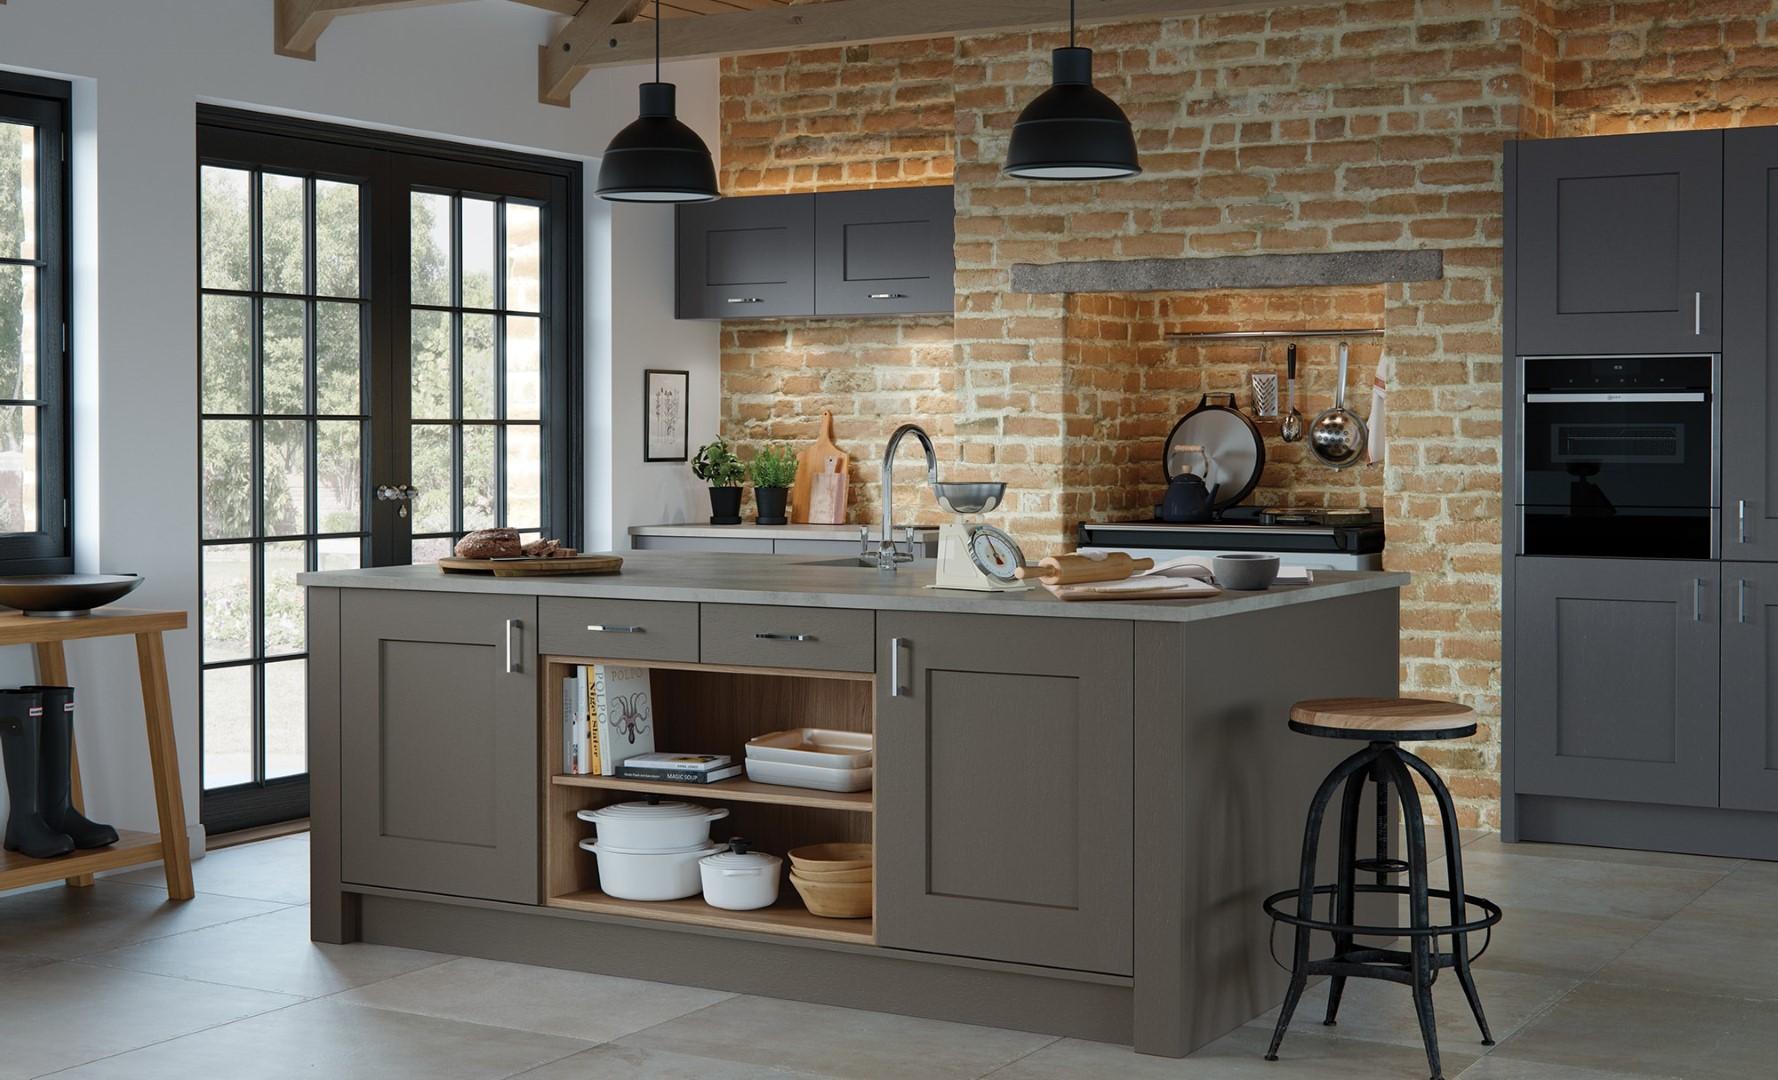 Classic Traditional Kitchen - Clonmel Lava, Graphite Kitchen - Kitchen Design - Alan Kelly Kitchens - Waterford